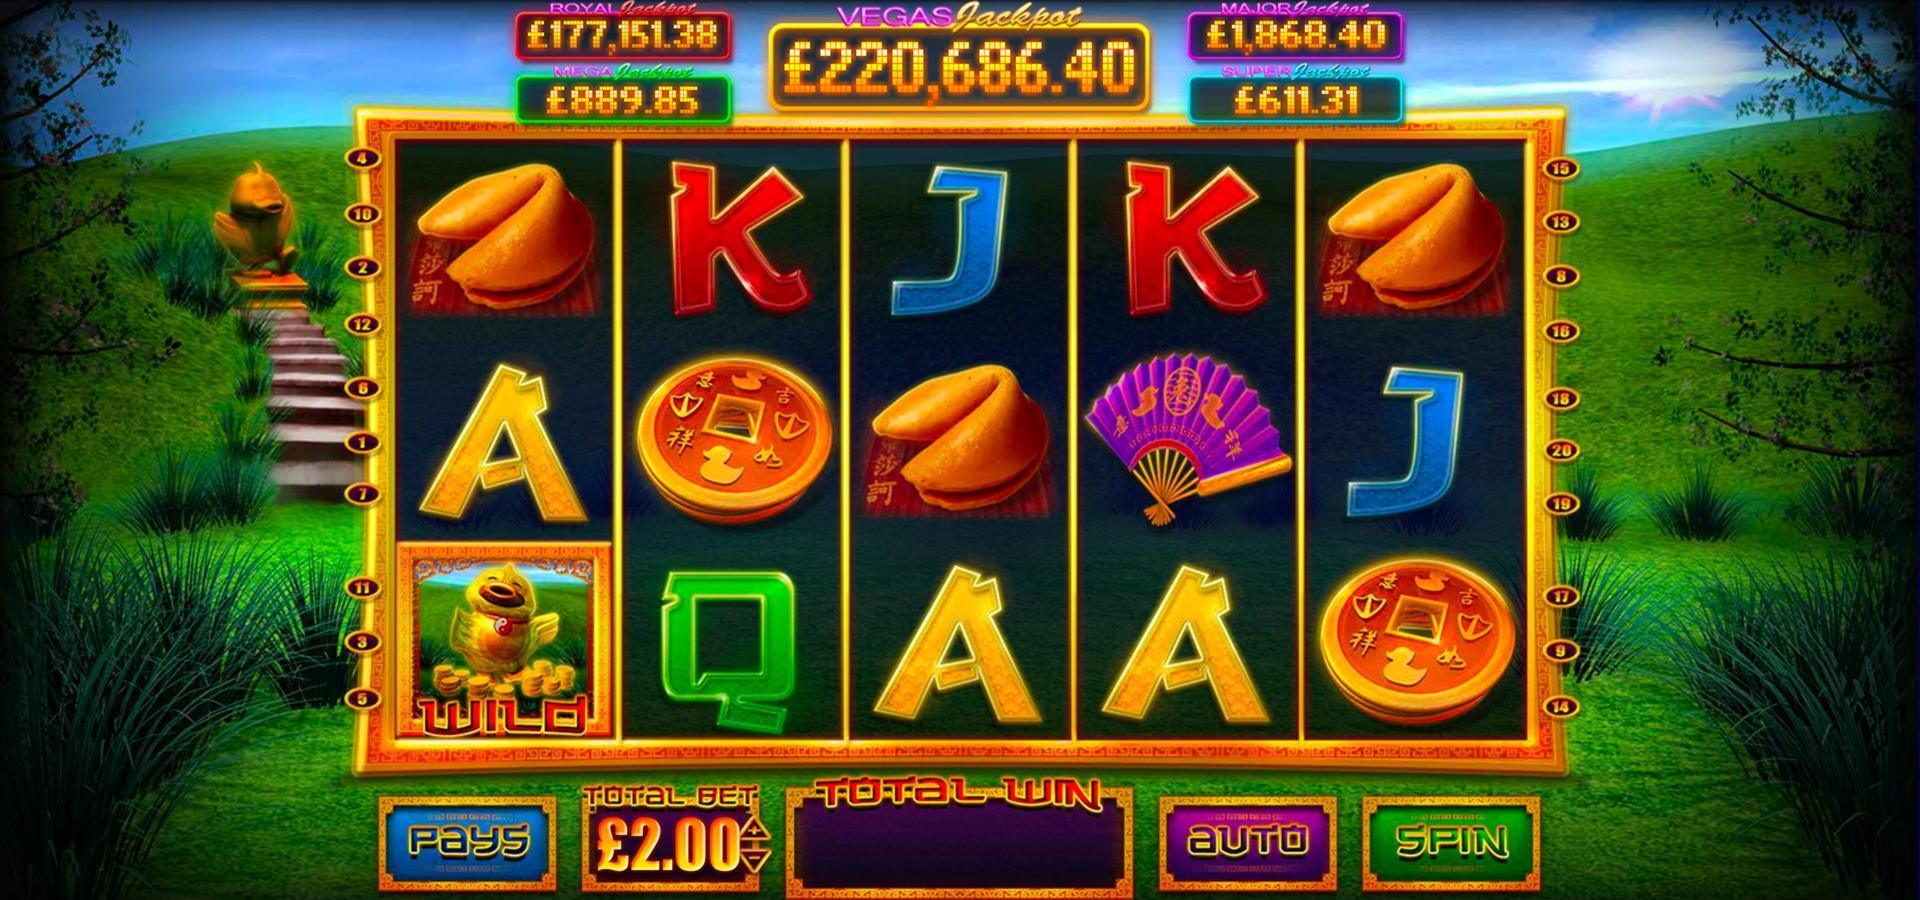 €3685 No Deposit Bonus Code at Europa Casino